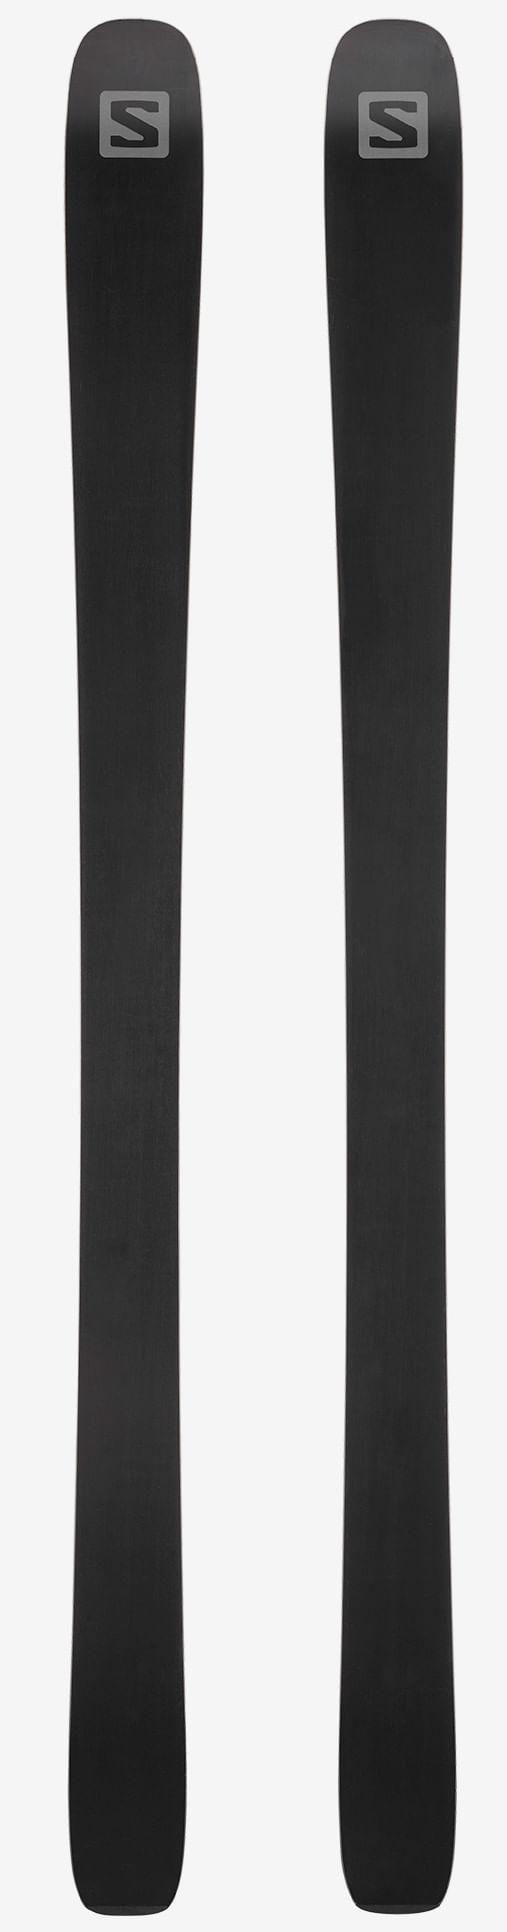 Salomon-Stance-96-Skis-2021